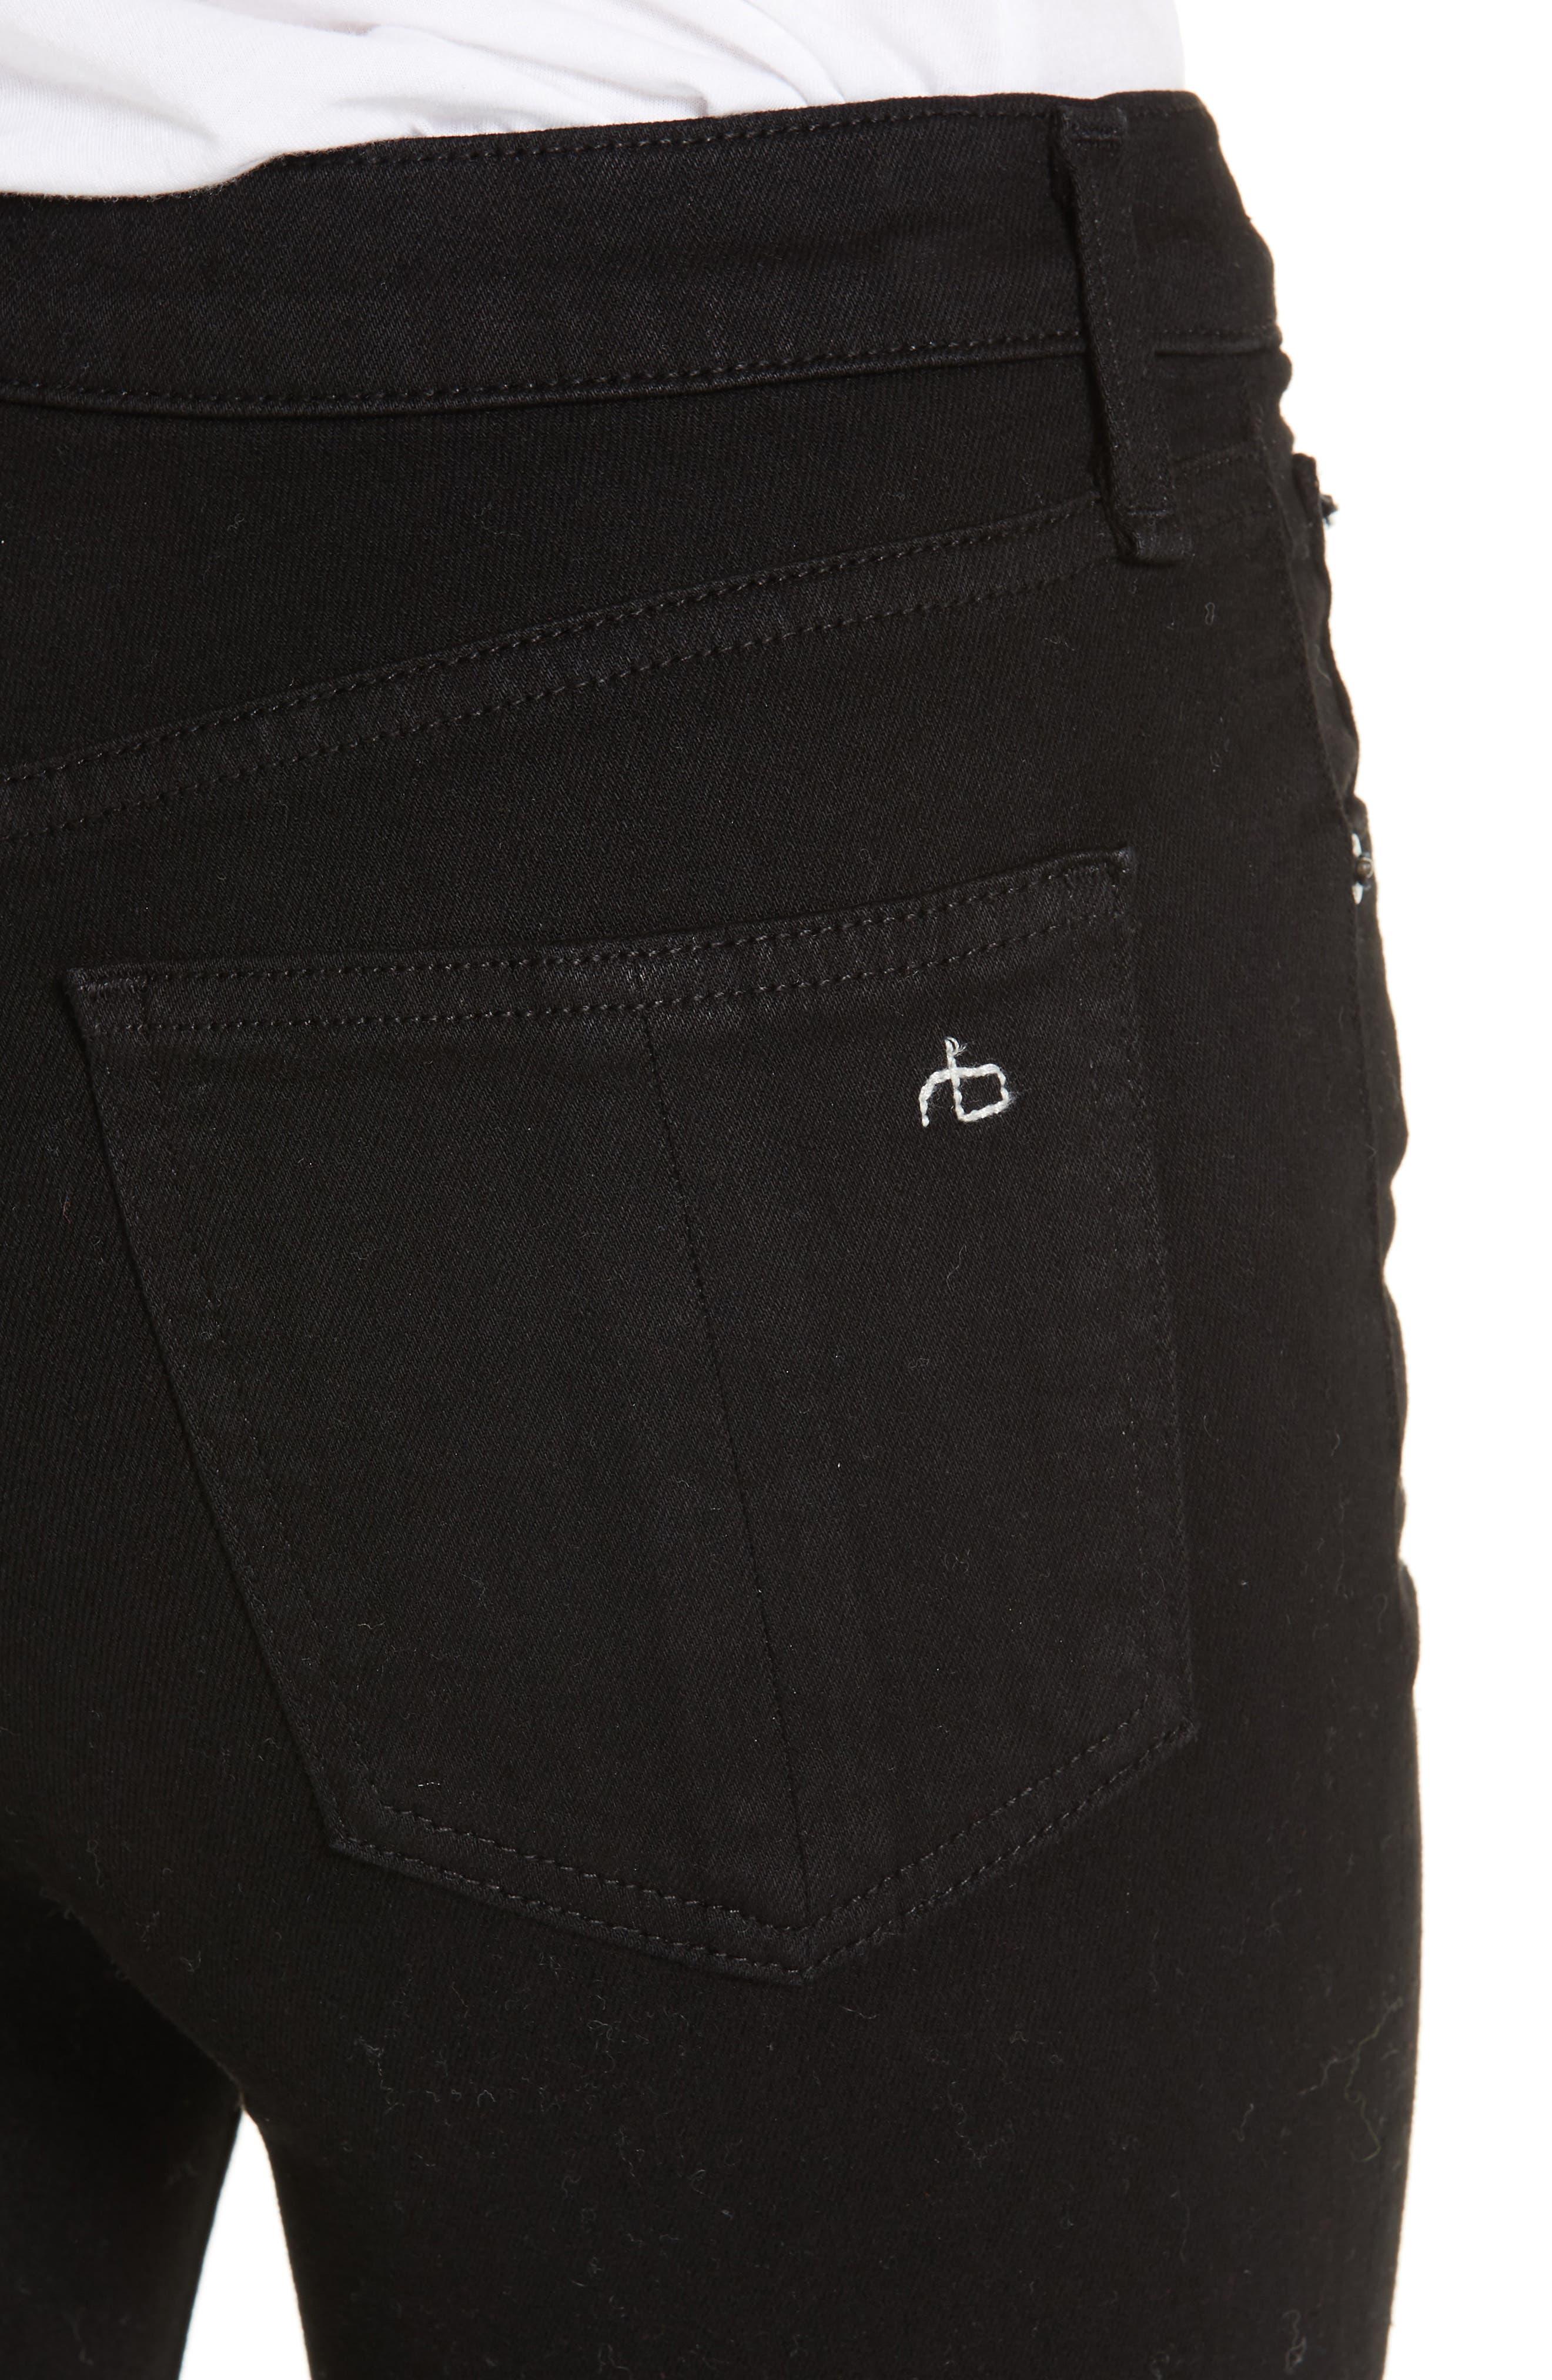 RAG & BONE,                             Hana High Waist Ankle Flare Jeans,                             Alternate thumbnail 4, color,                             001